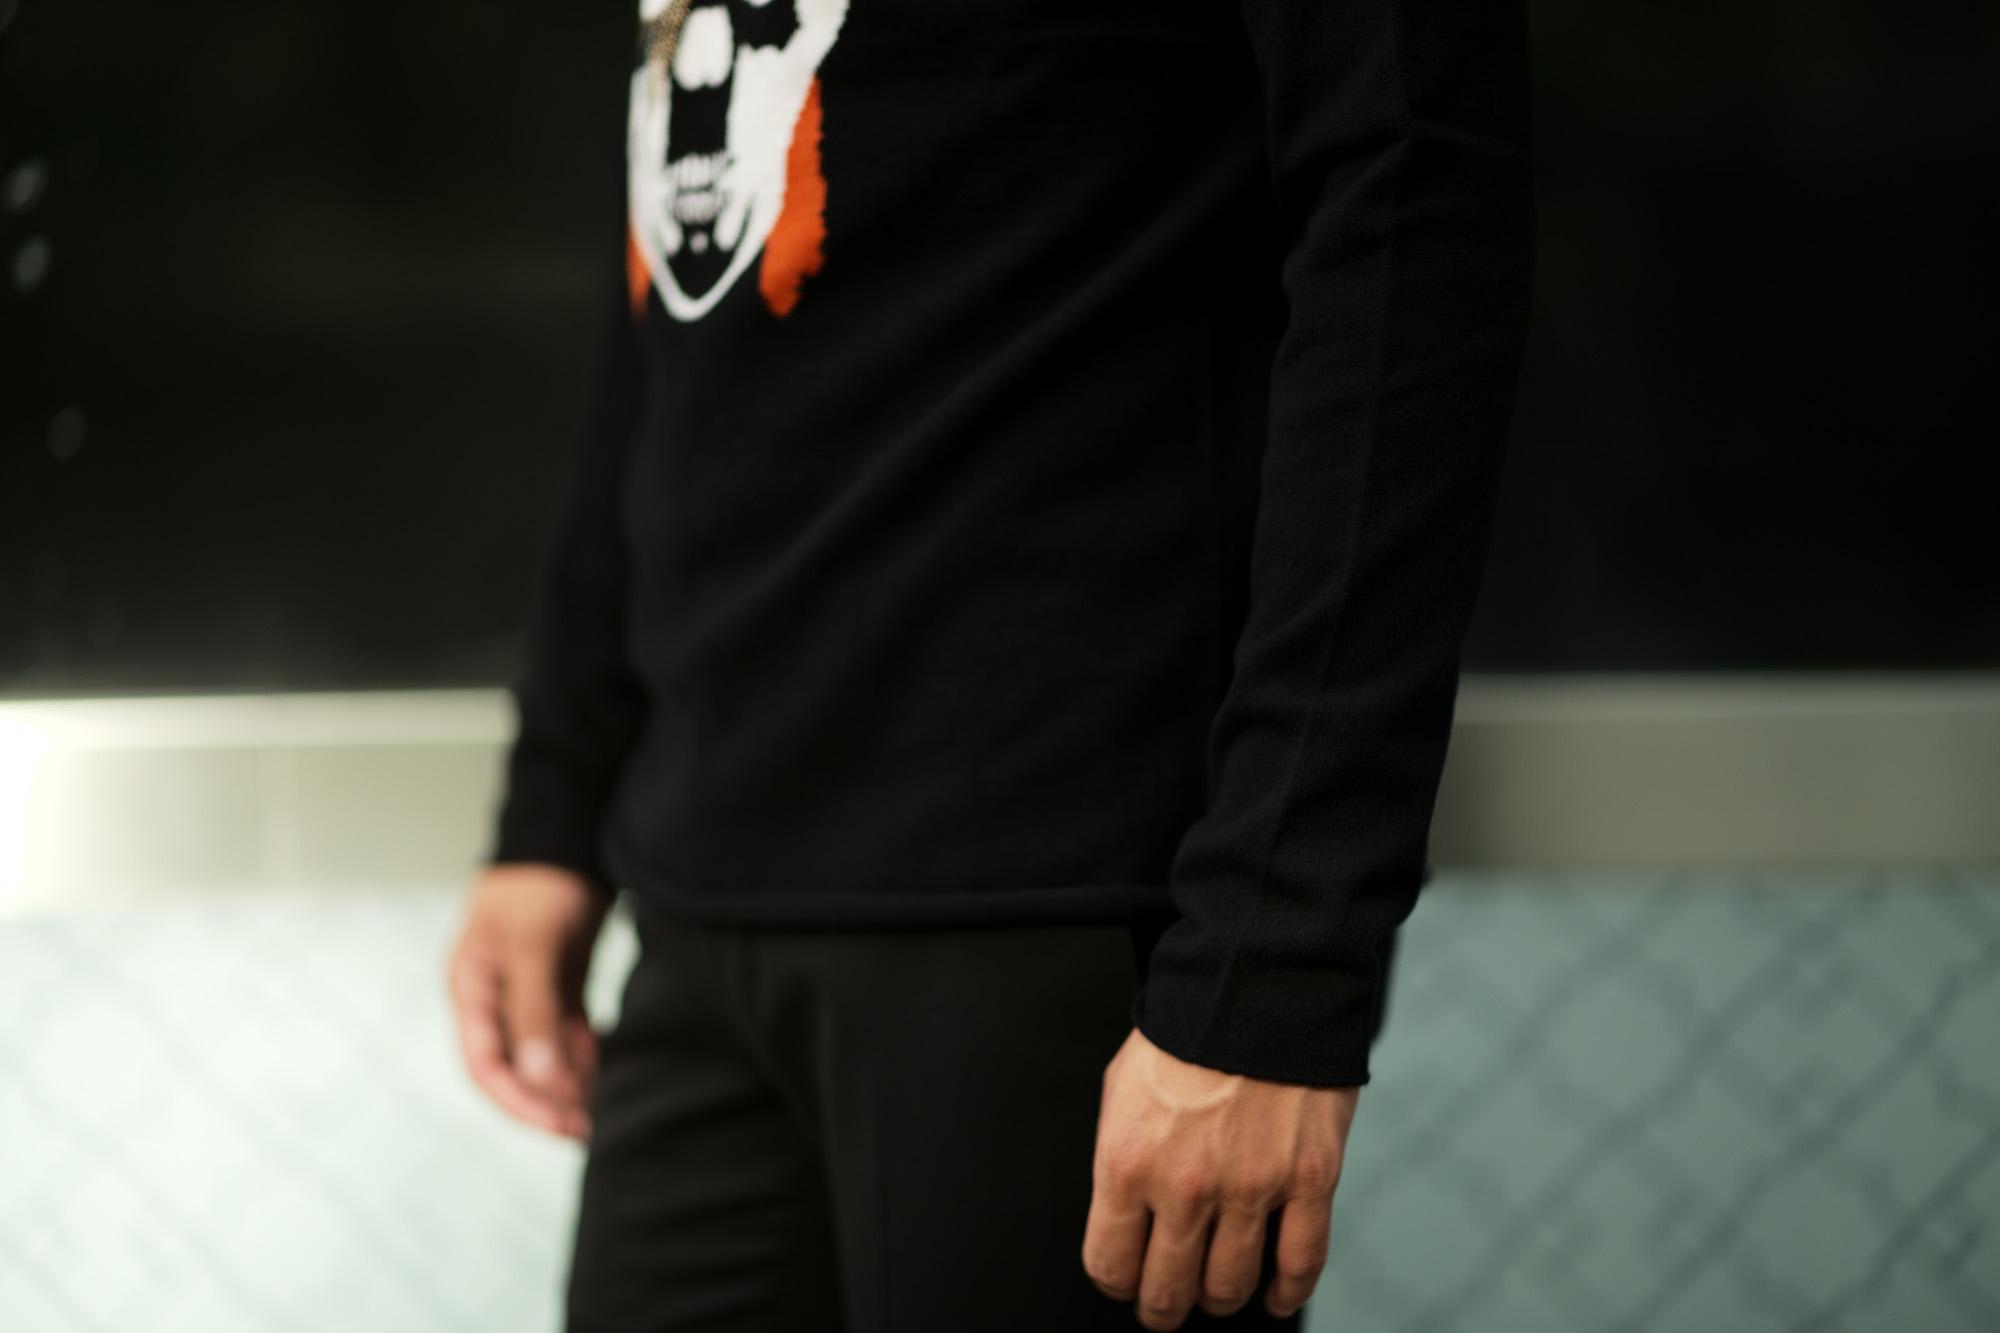 lucien pellat-finet(ルシアン ペラフィネ) David Bowie Skull Cashmere Sweater (デヴィッド ボウイ スカル カシミア セーター) インターシャ カシミア スカル セーター BLACK × NIVEOUS (ブラック × ホワイト) 愛知 名古屋 altoediritto アルトエデリット